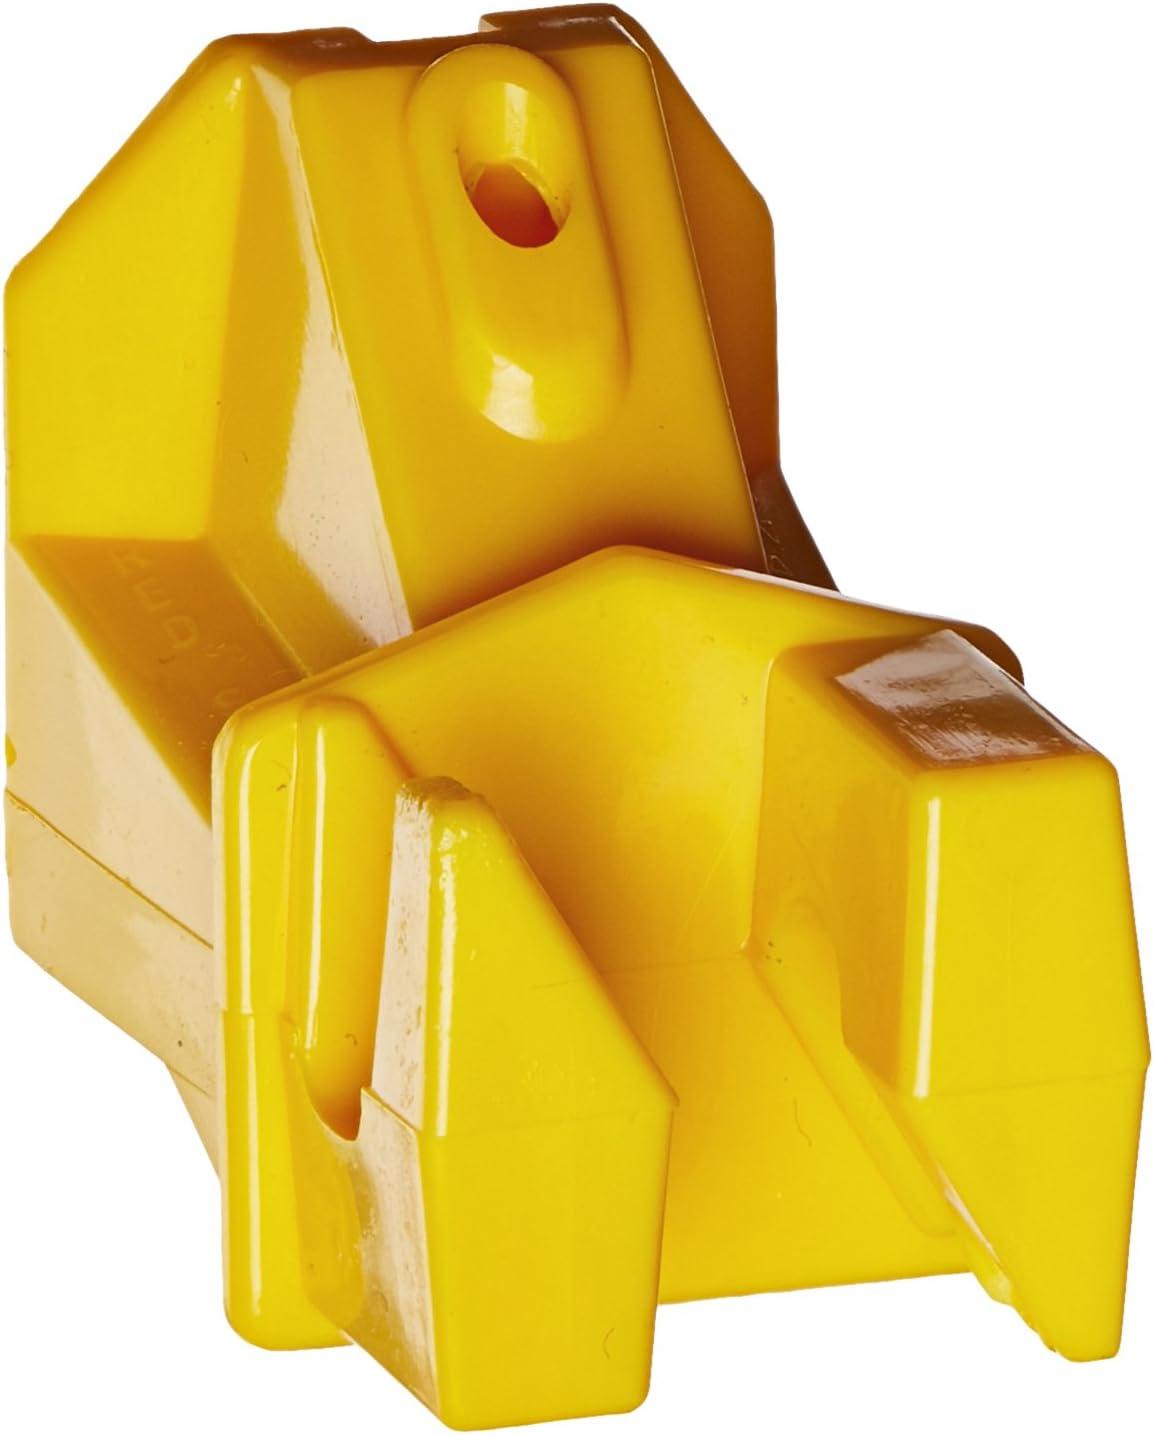 Finally popular brand Zareba Wood Mail order cheap Post Insulator SF25WP